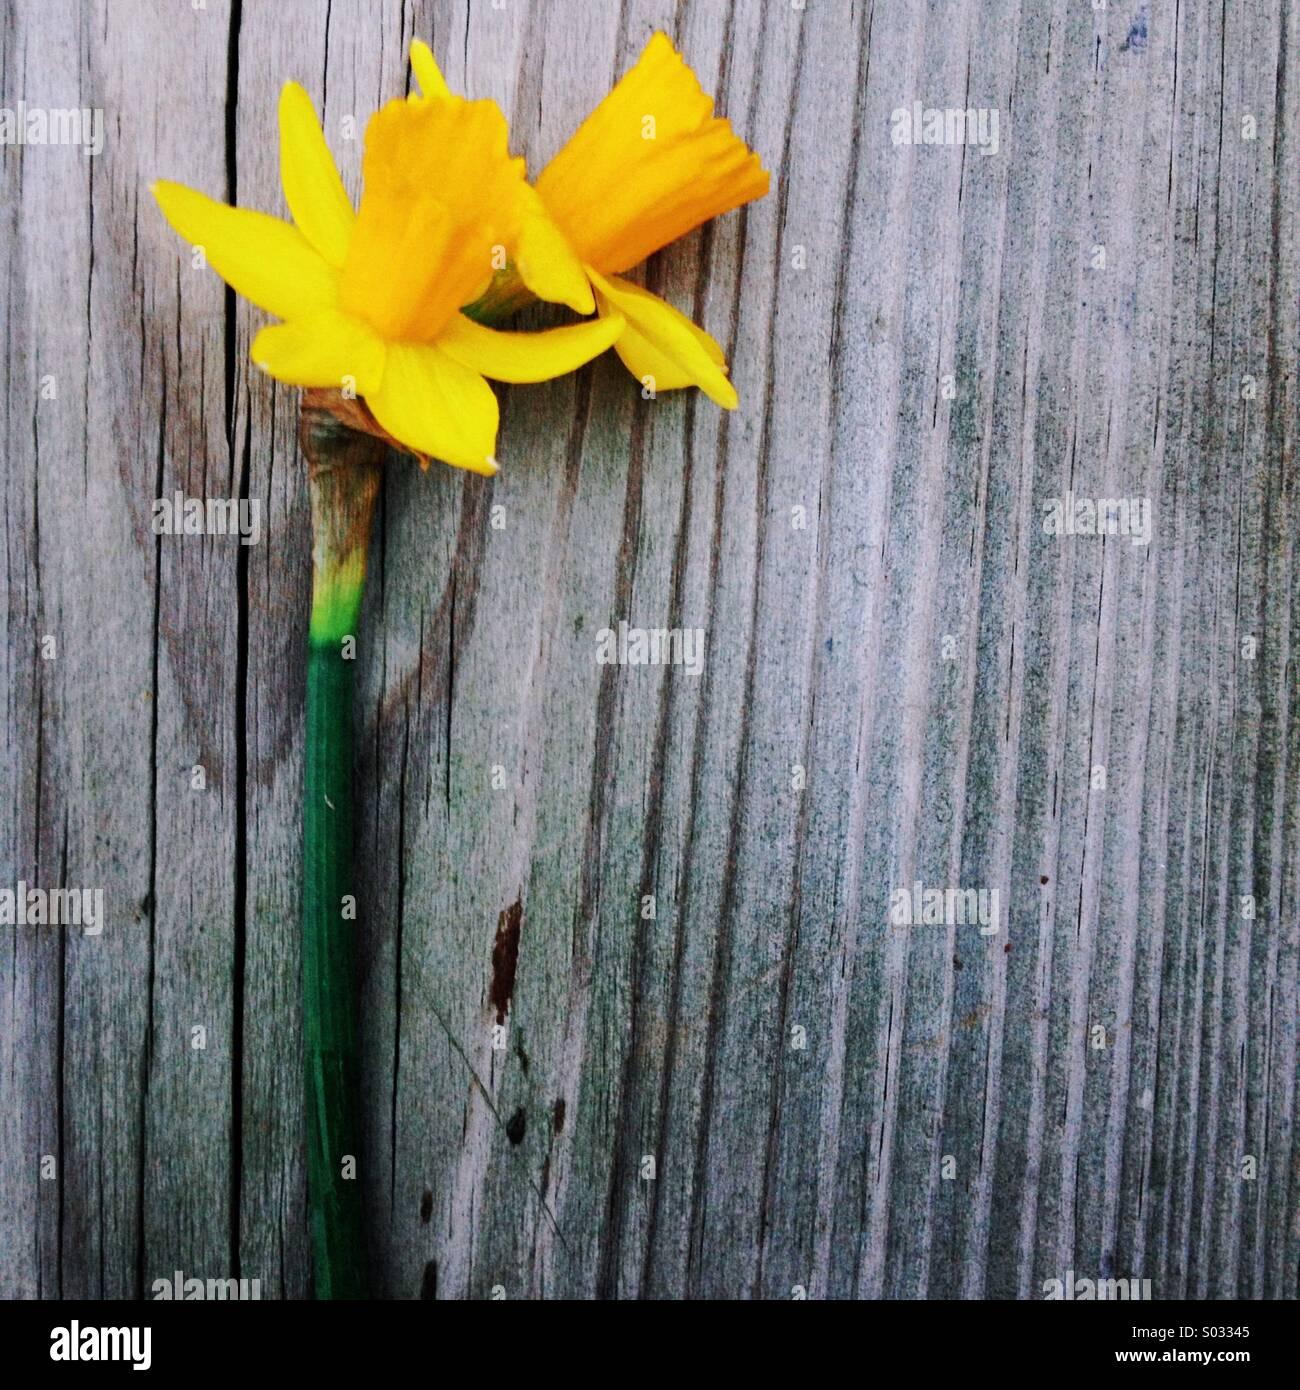 De cerca una doble cabeza daffodil sentar sobre un fondo de madera Imagen De Stock